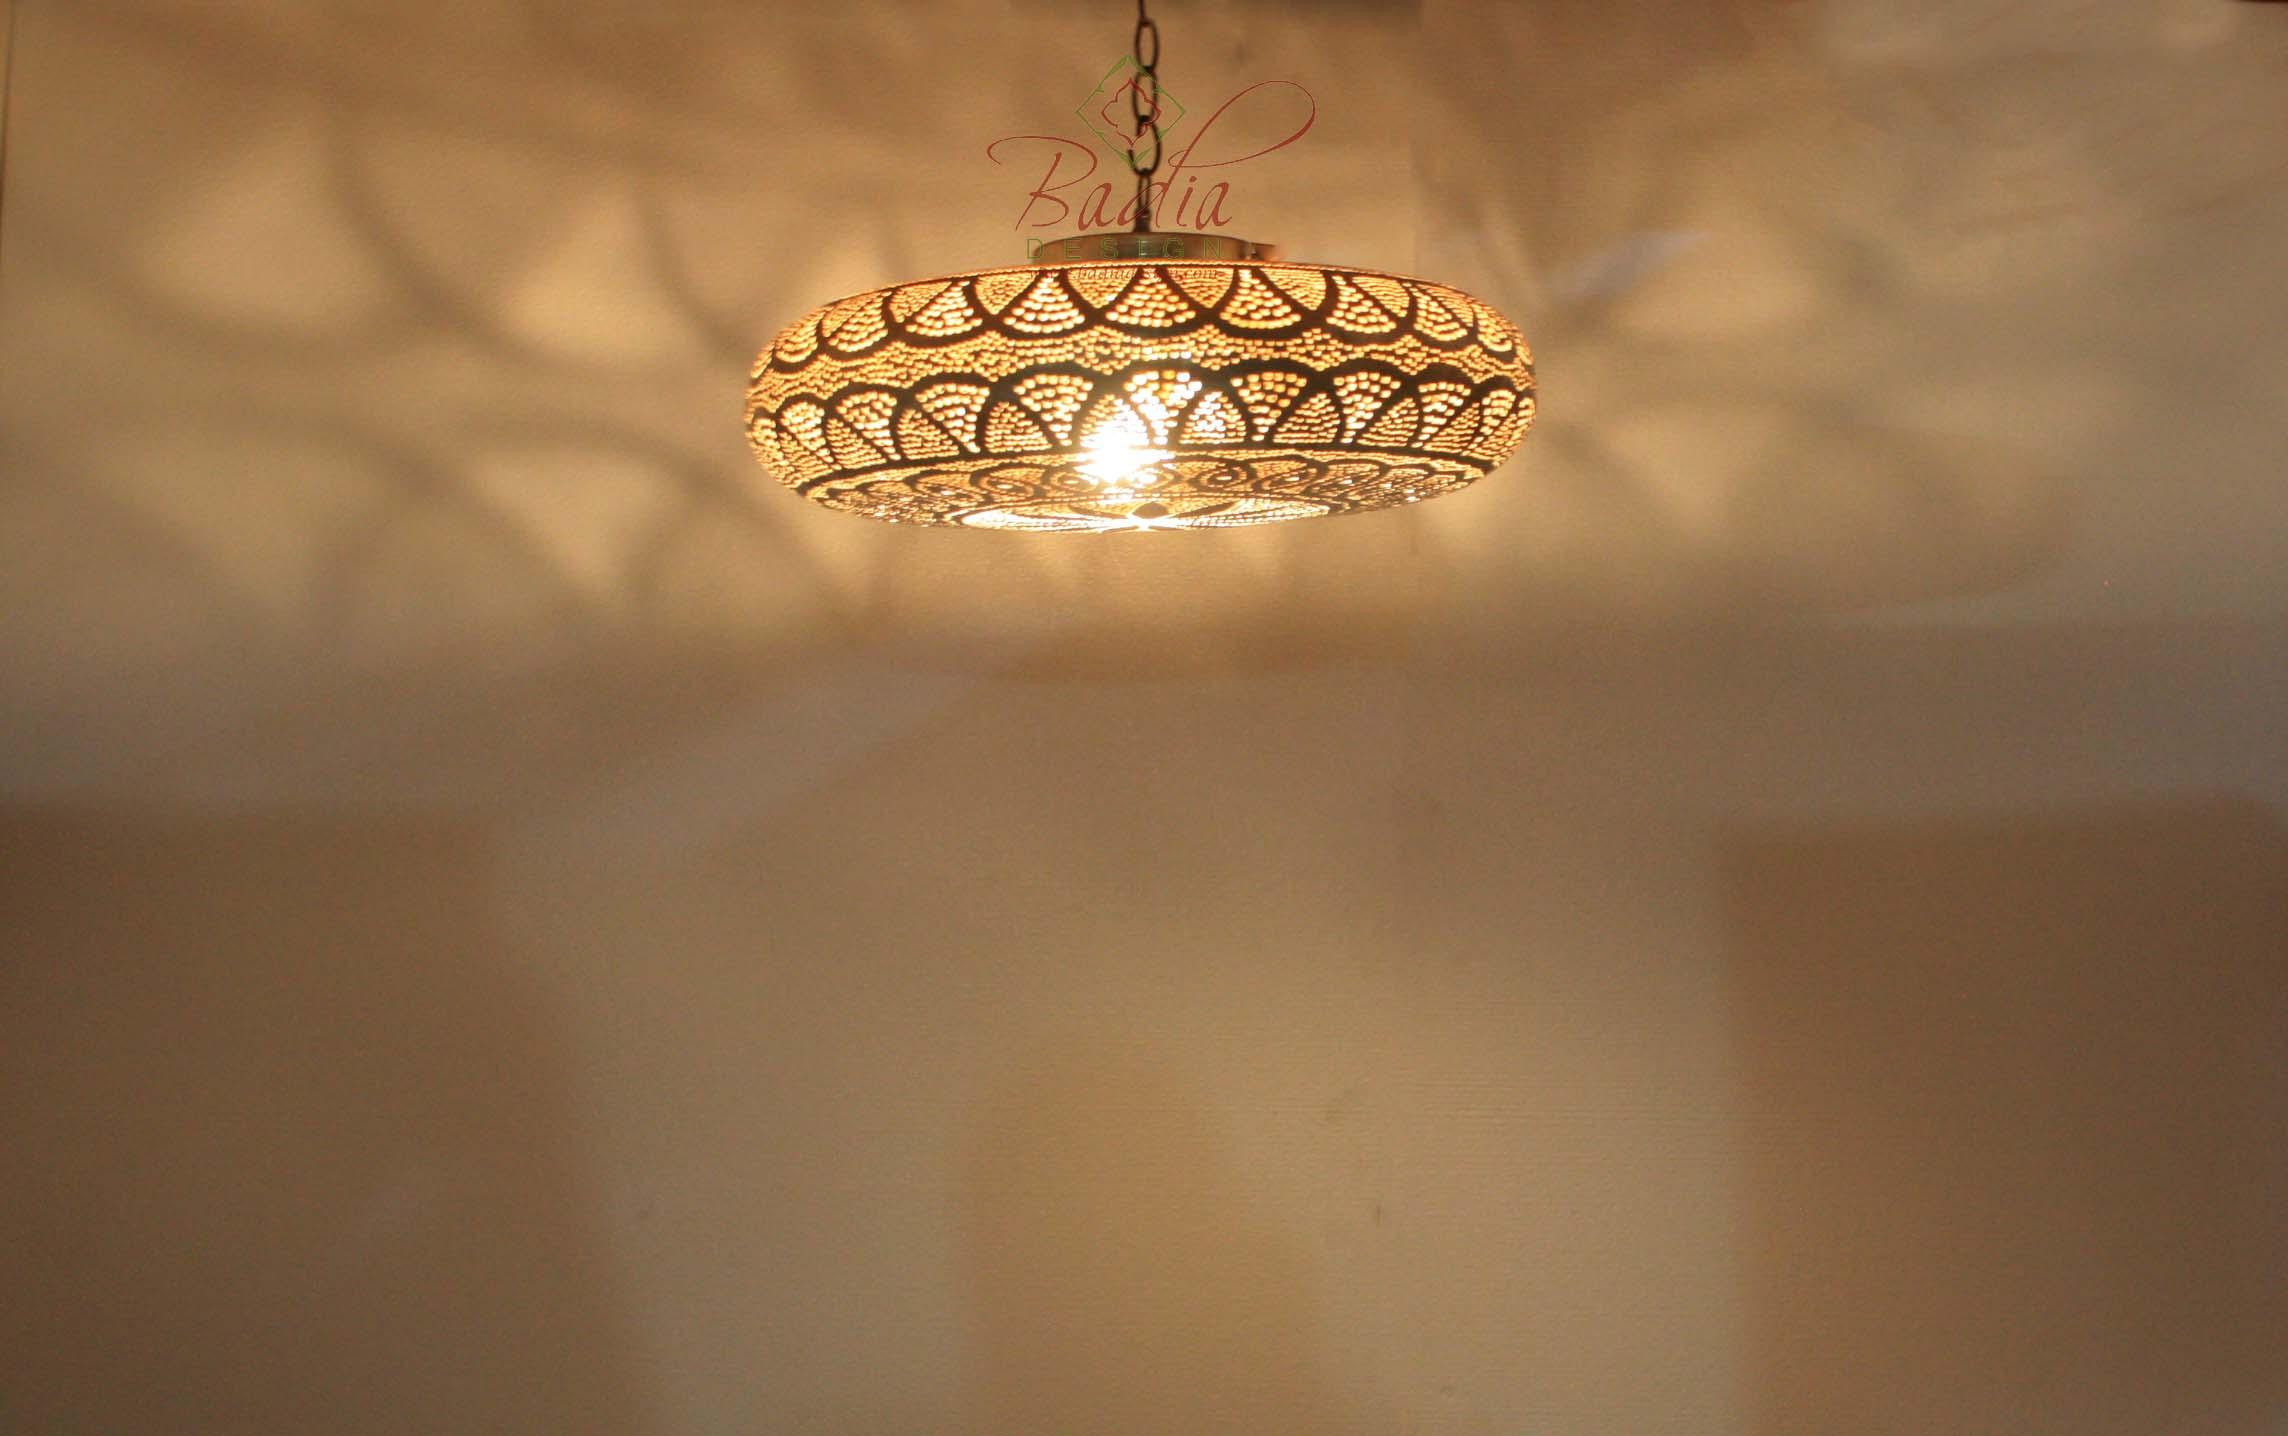 moroccan-saucer-shaped-silver-light-lig310-1.jpg